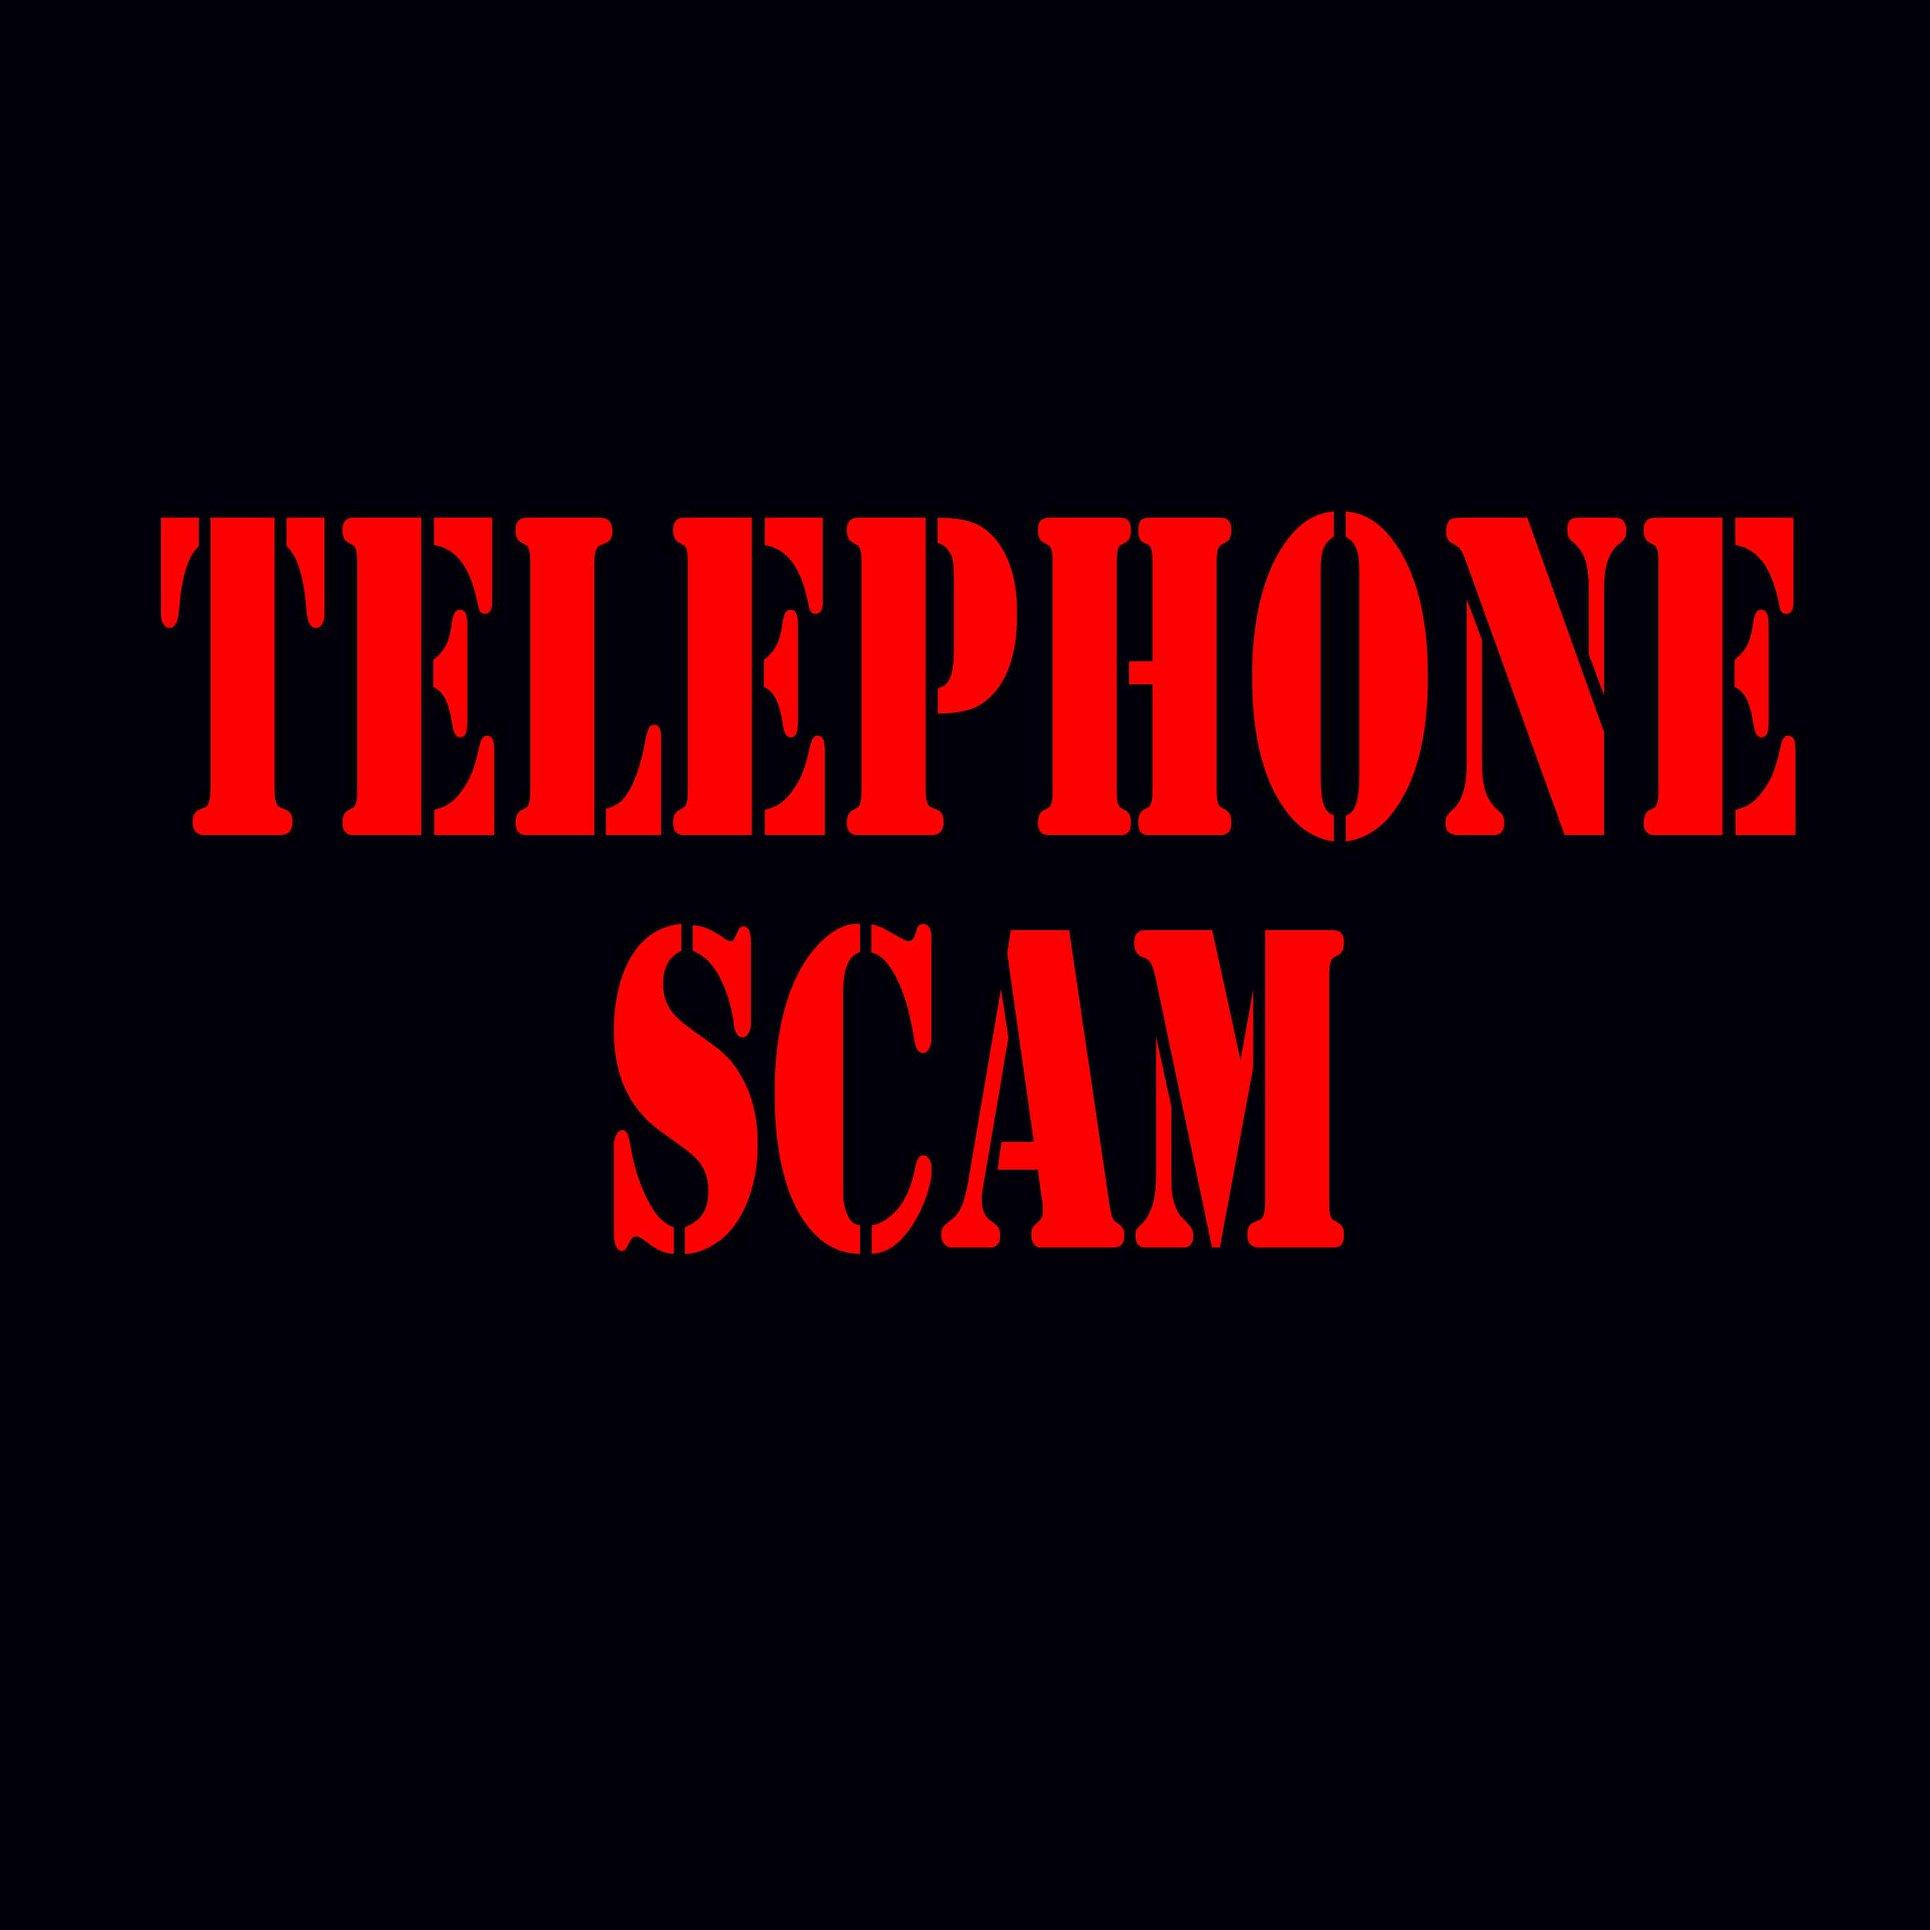 Atascadero Police warn of telephone scam